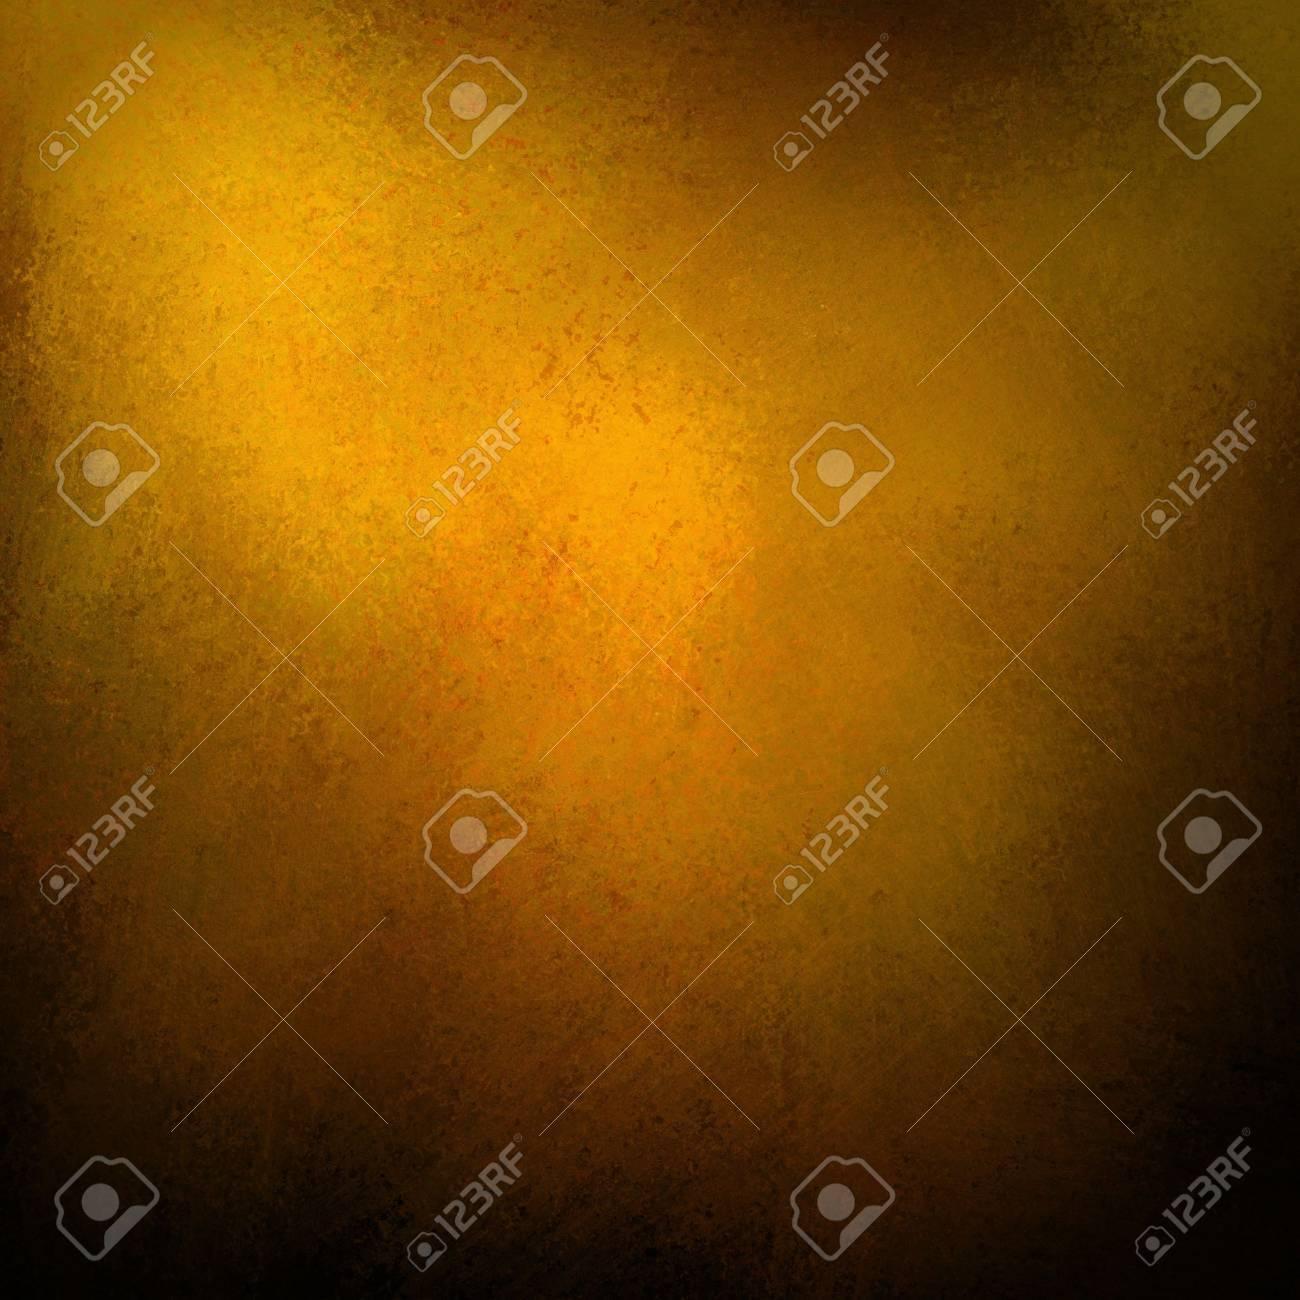 gold vintage background with black vignette border Stock Photo - 18516562